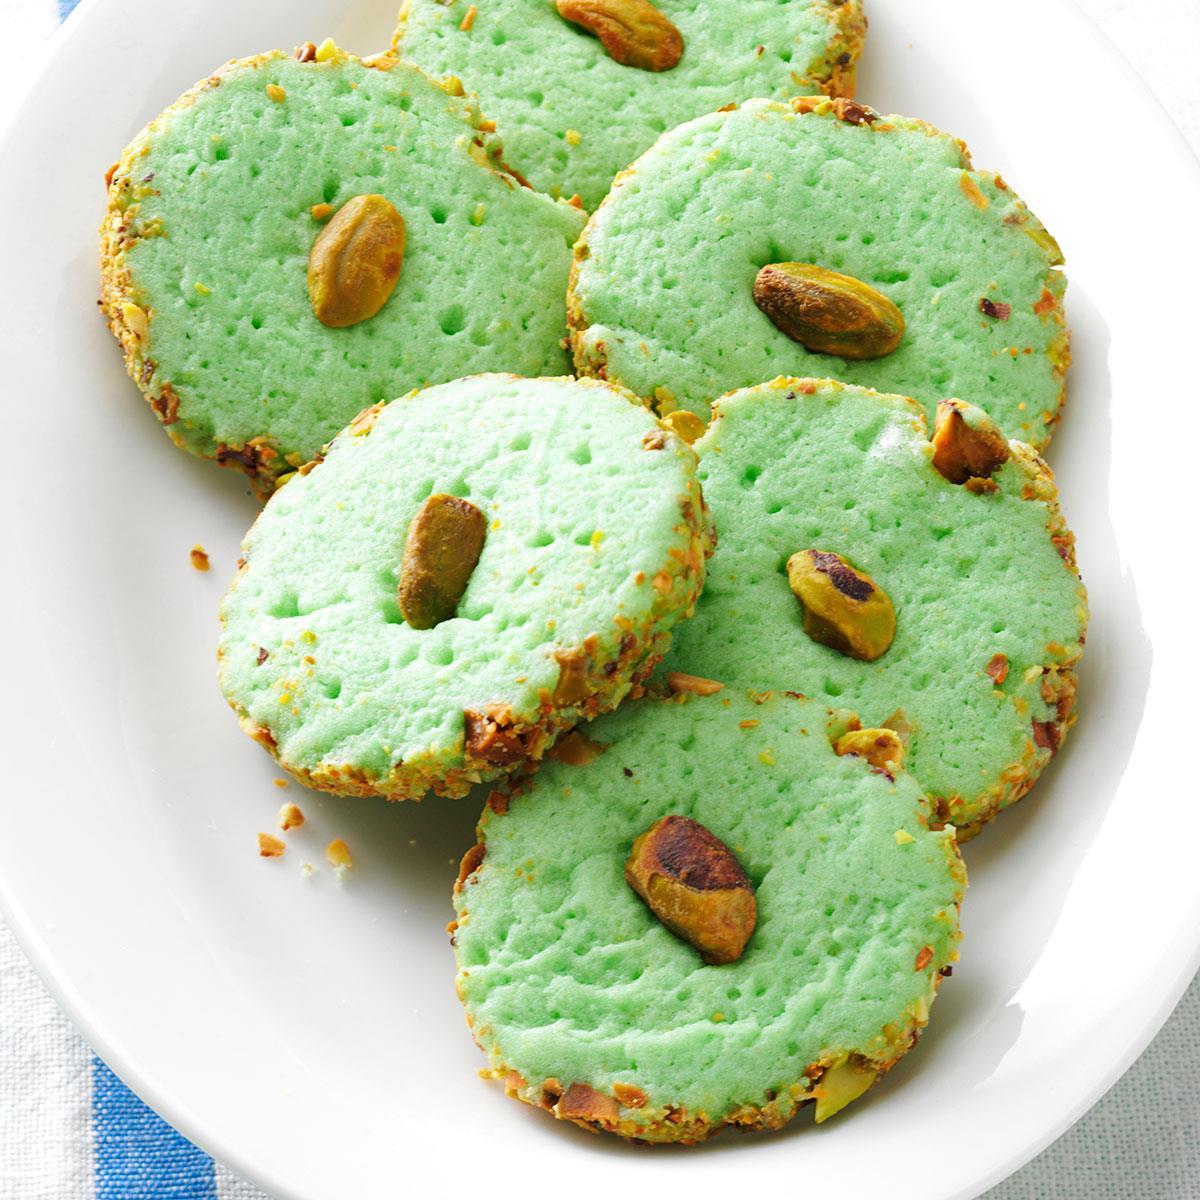 Pistachio Cream Cheese Cookies image